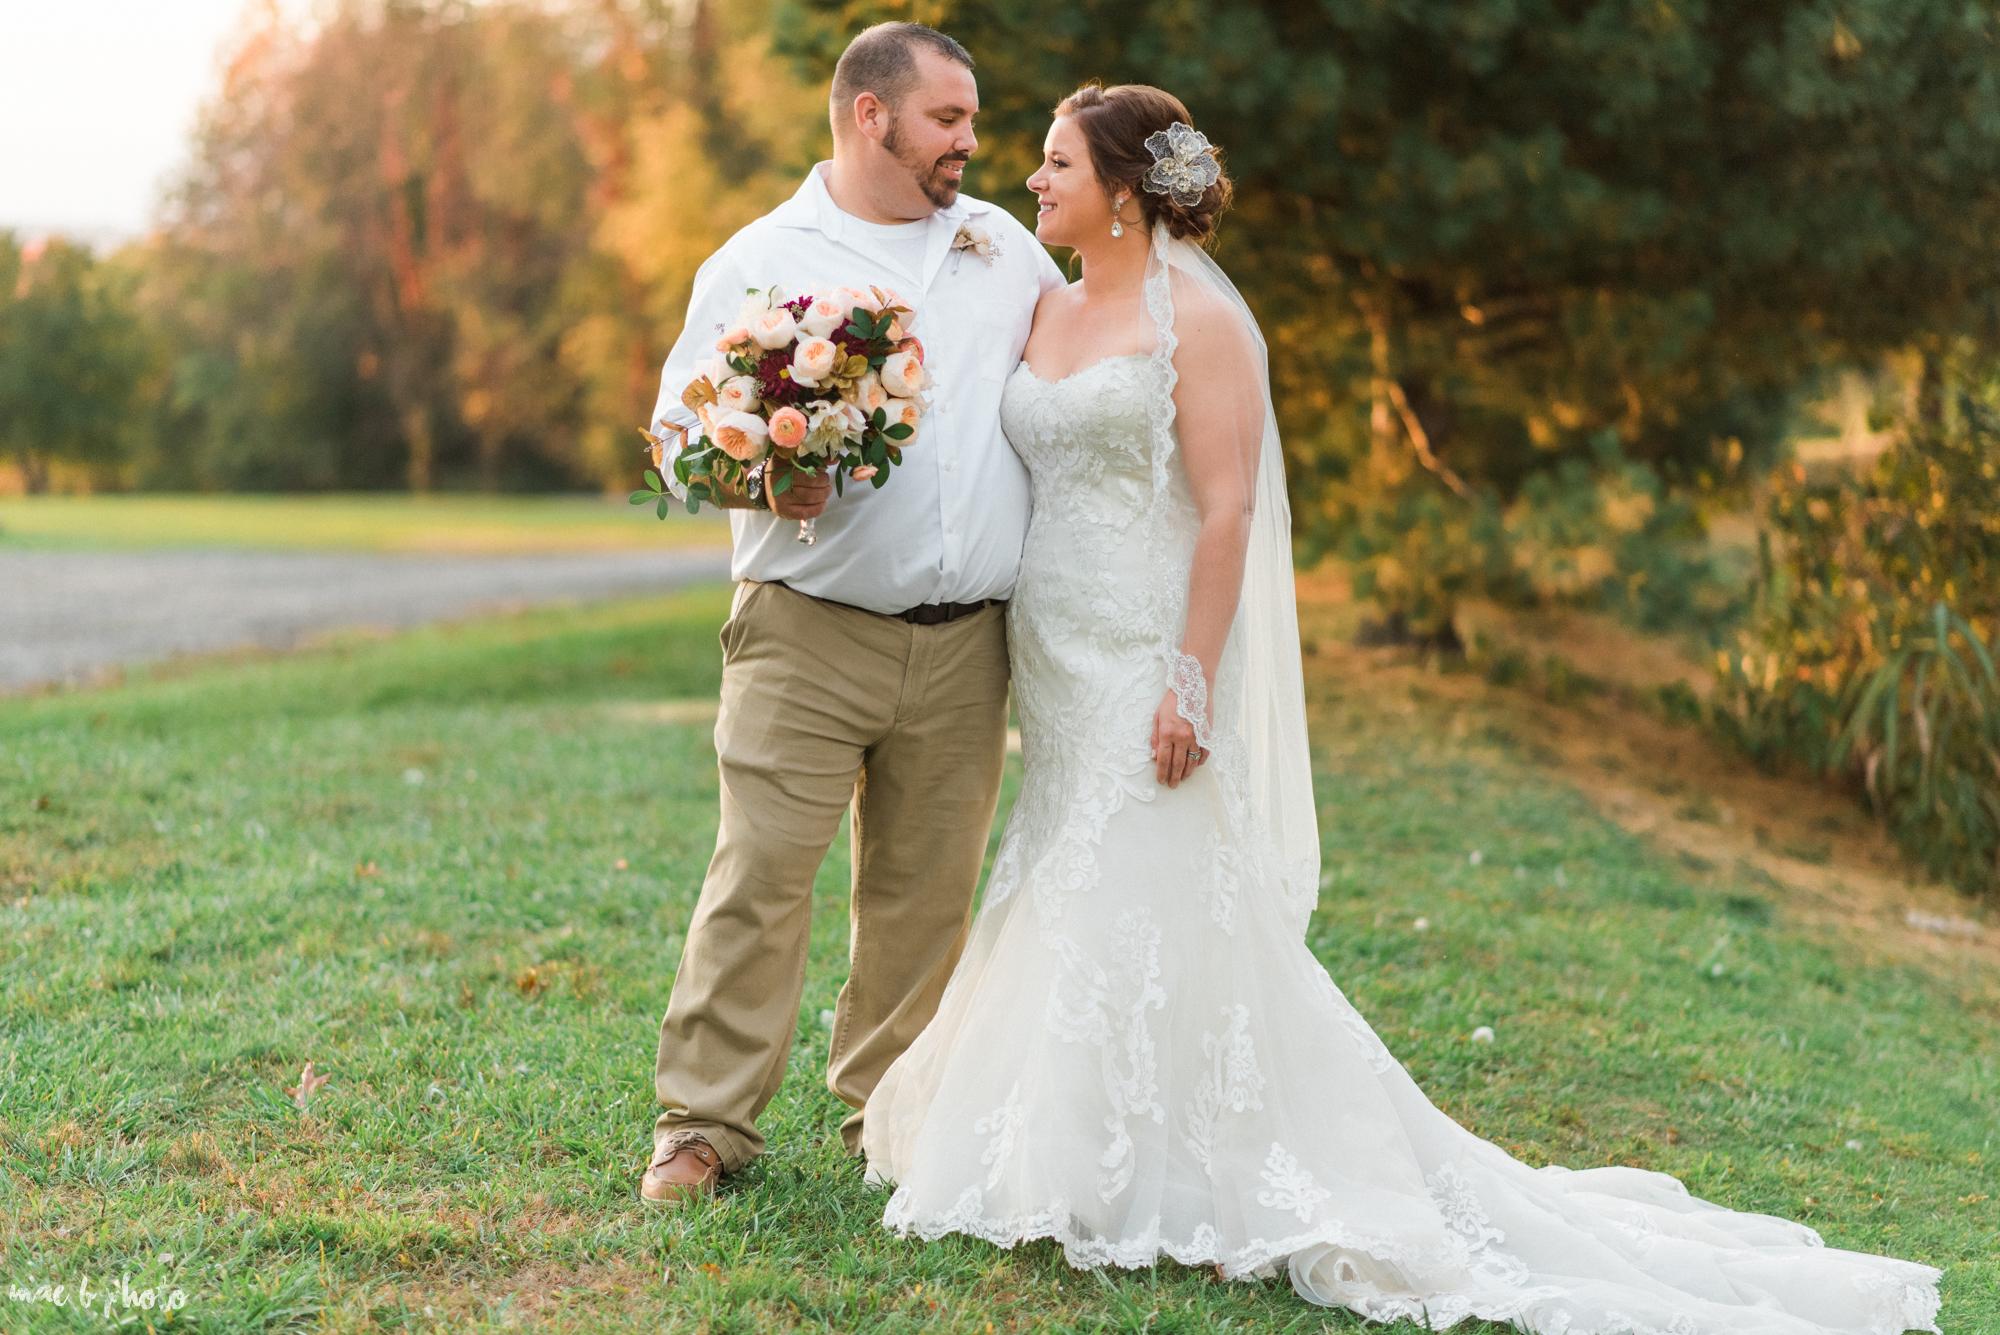 Sarah & Dustin's Rustic Chic Barn Wedding at Hartford Hill Winery in Hartford, Ohio by Mae B Photo-81.jpg